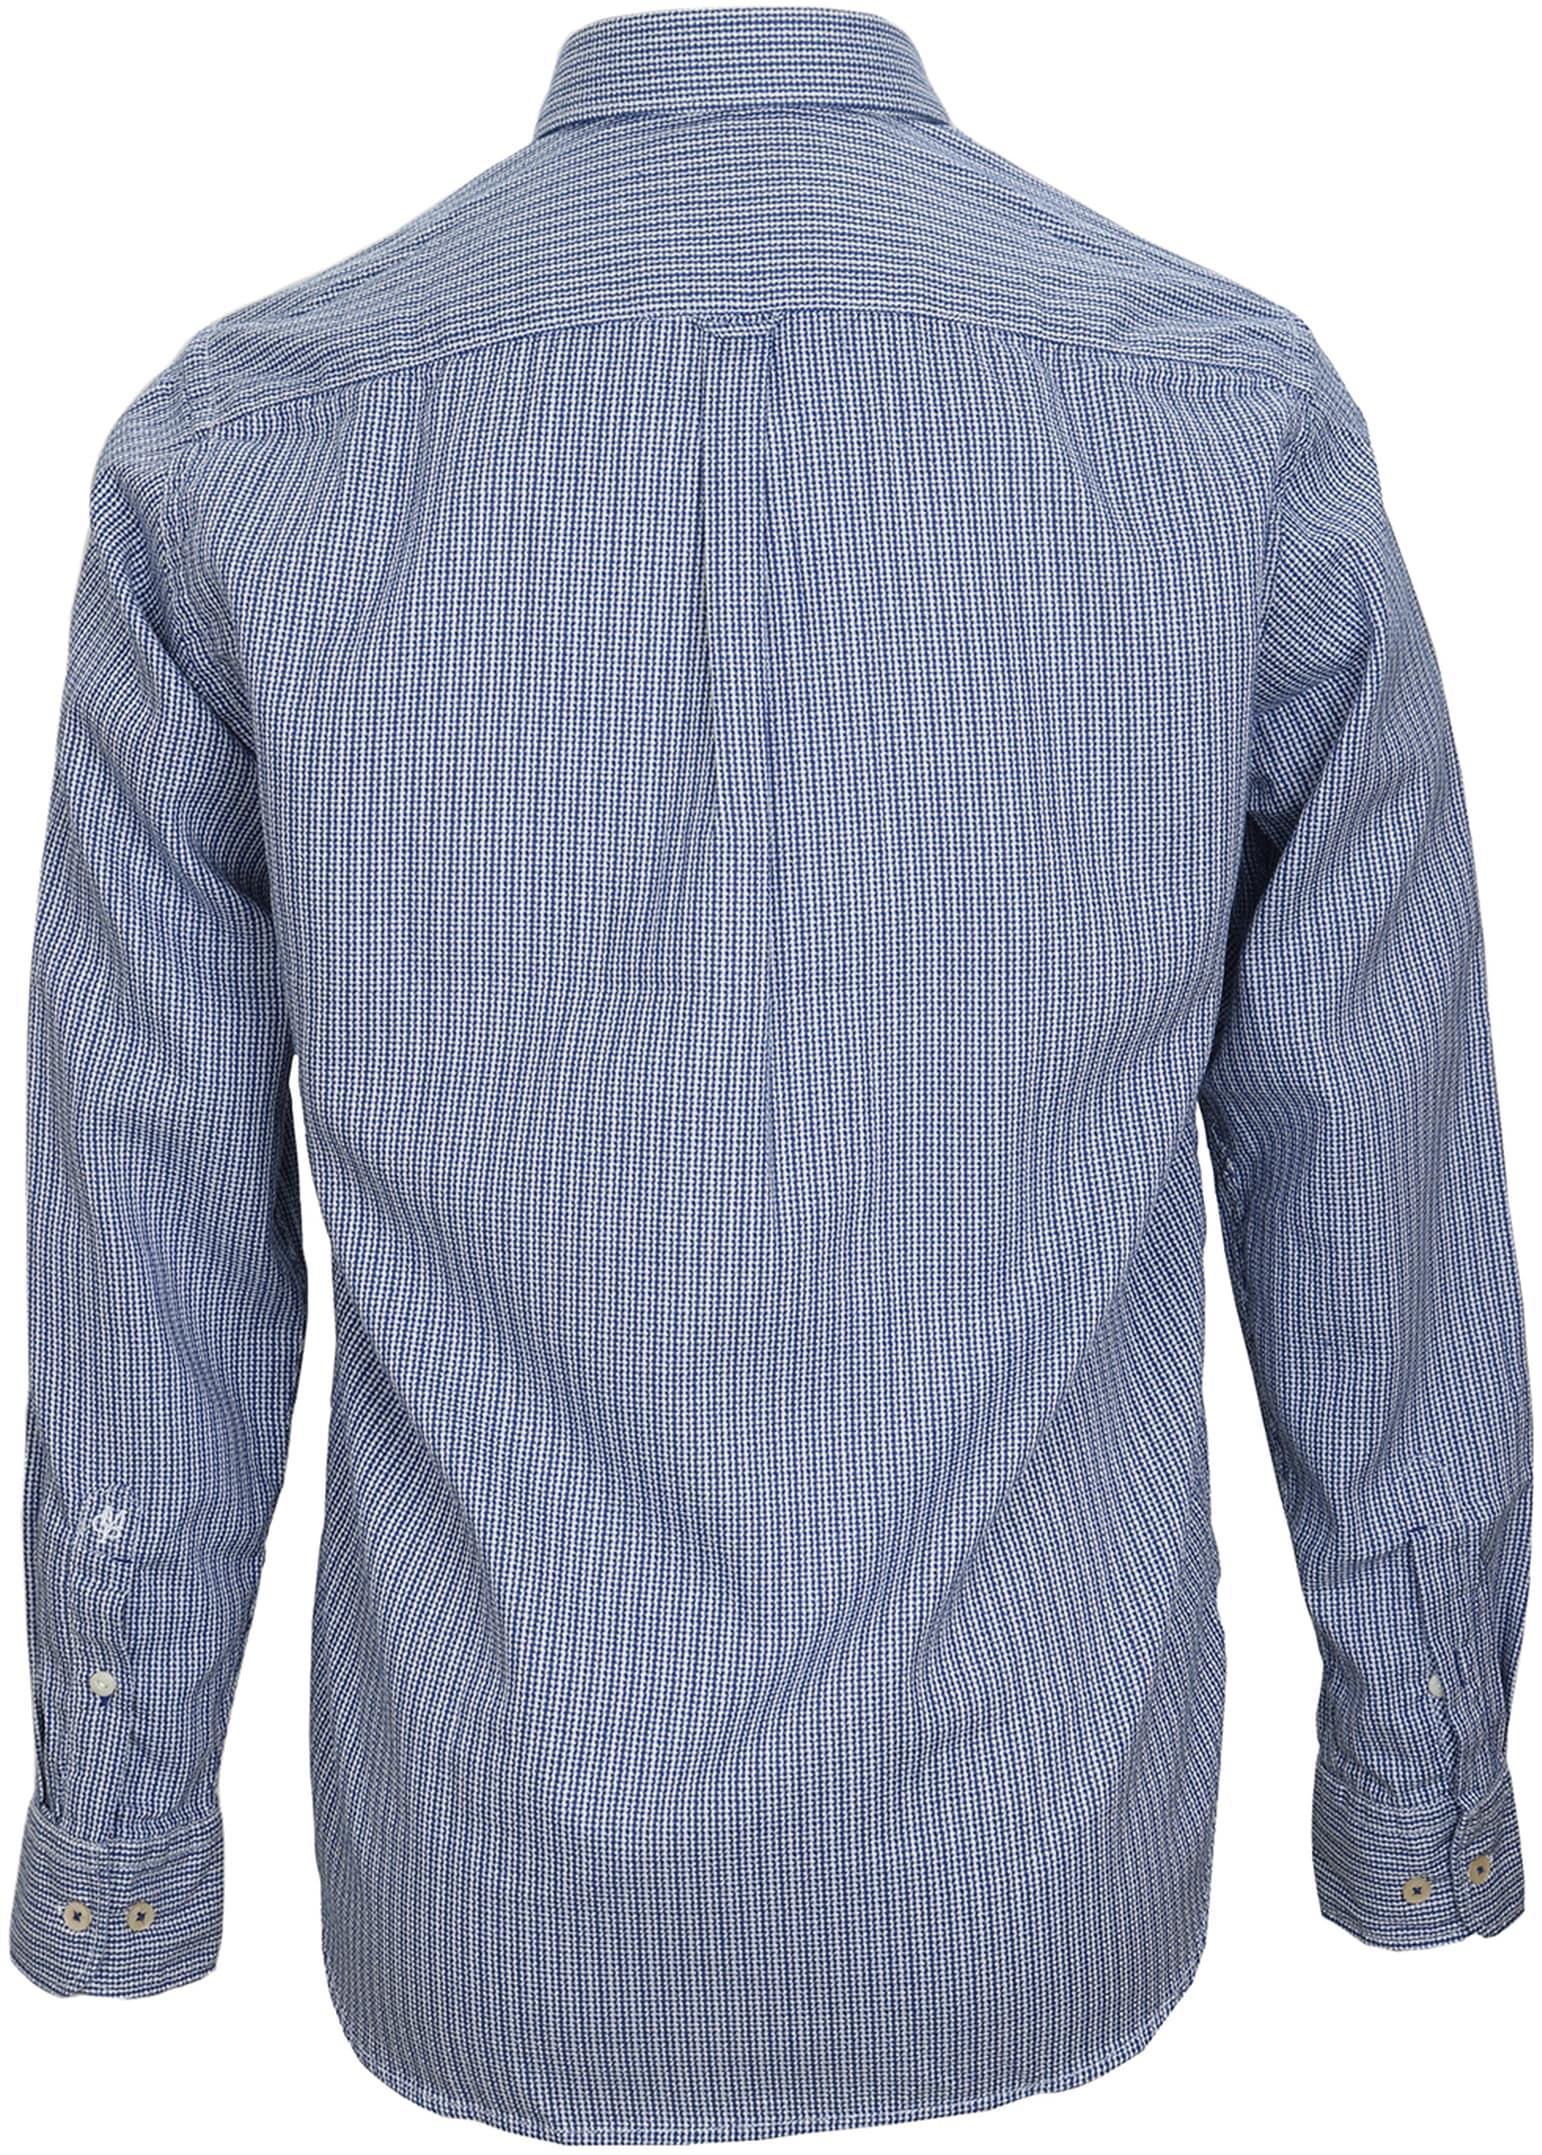 Marc O'Polo Overhemd Dessin Navy foto 2